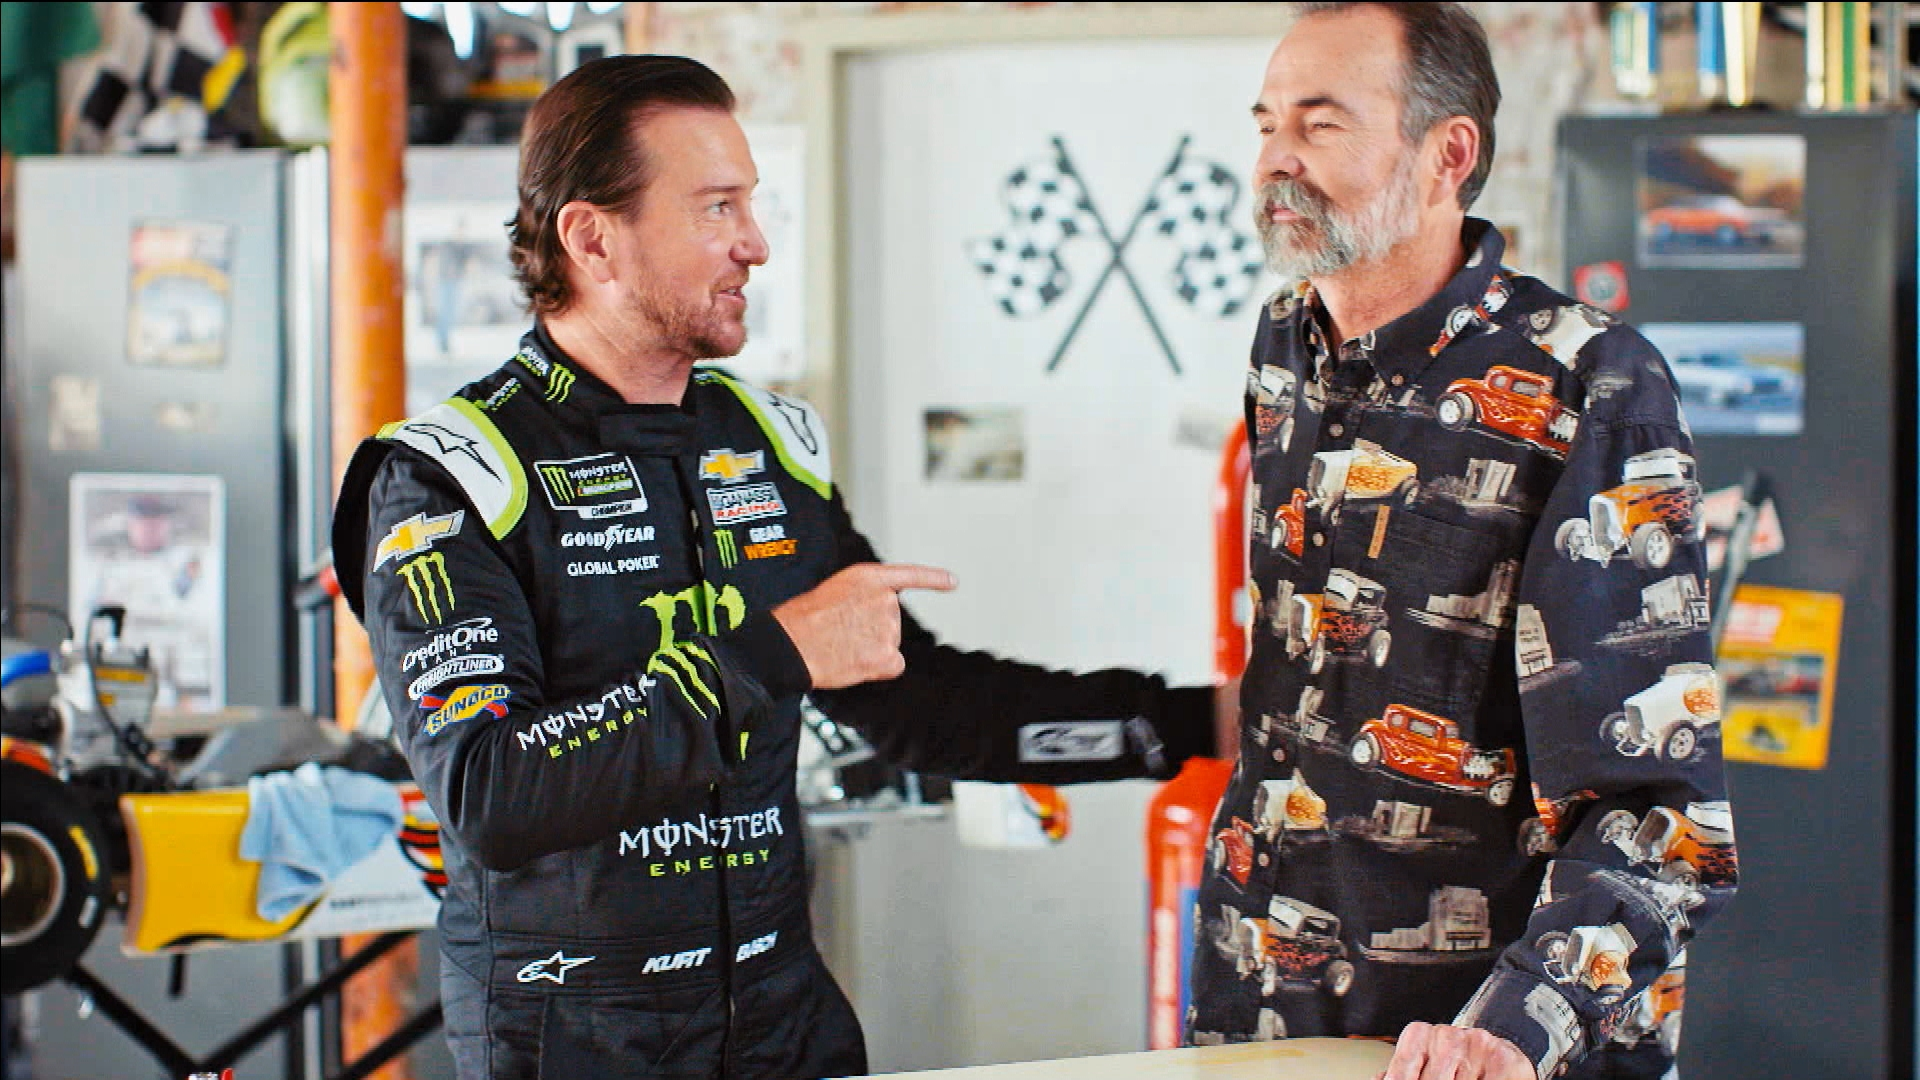 NASCAR Behind the Driver: Kurt Busch learns preparation from Tom Busch